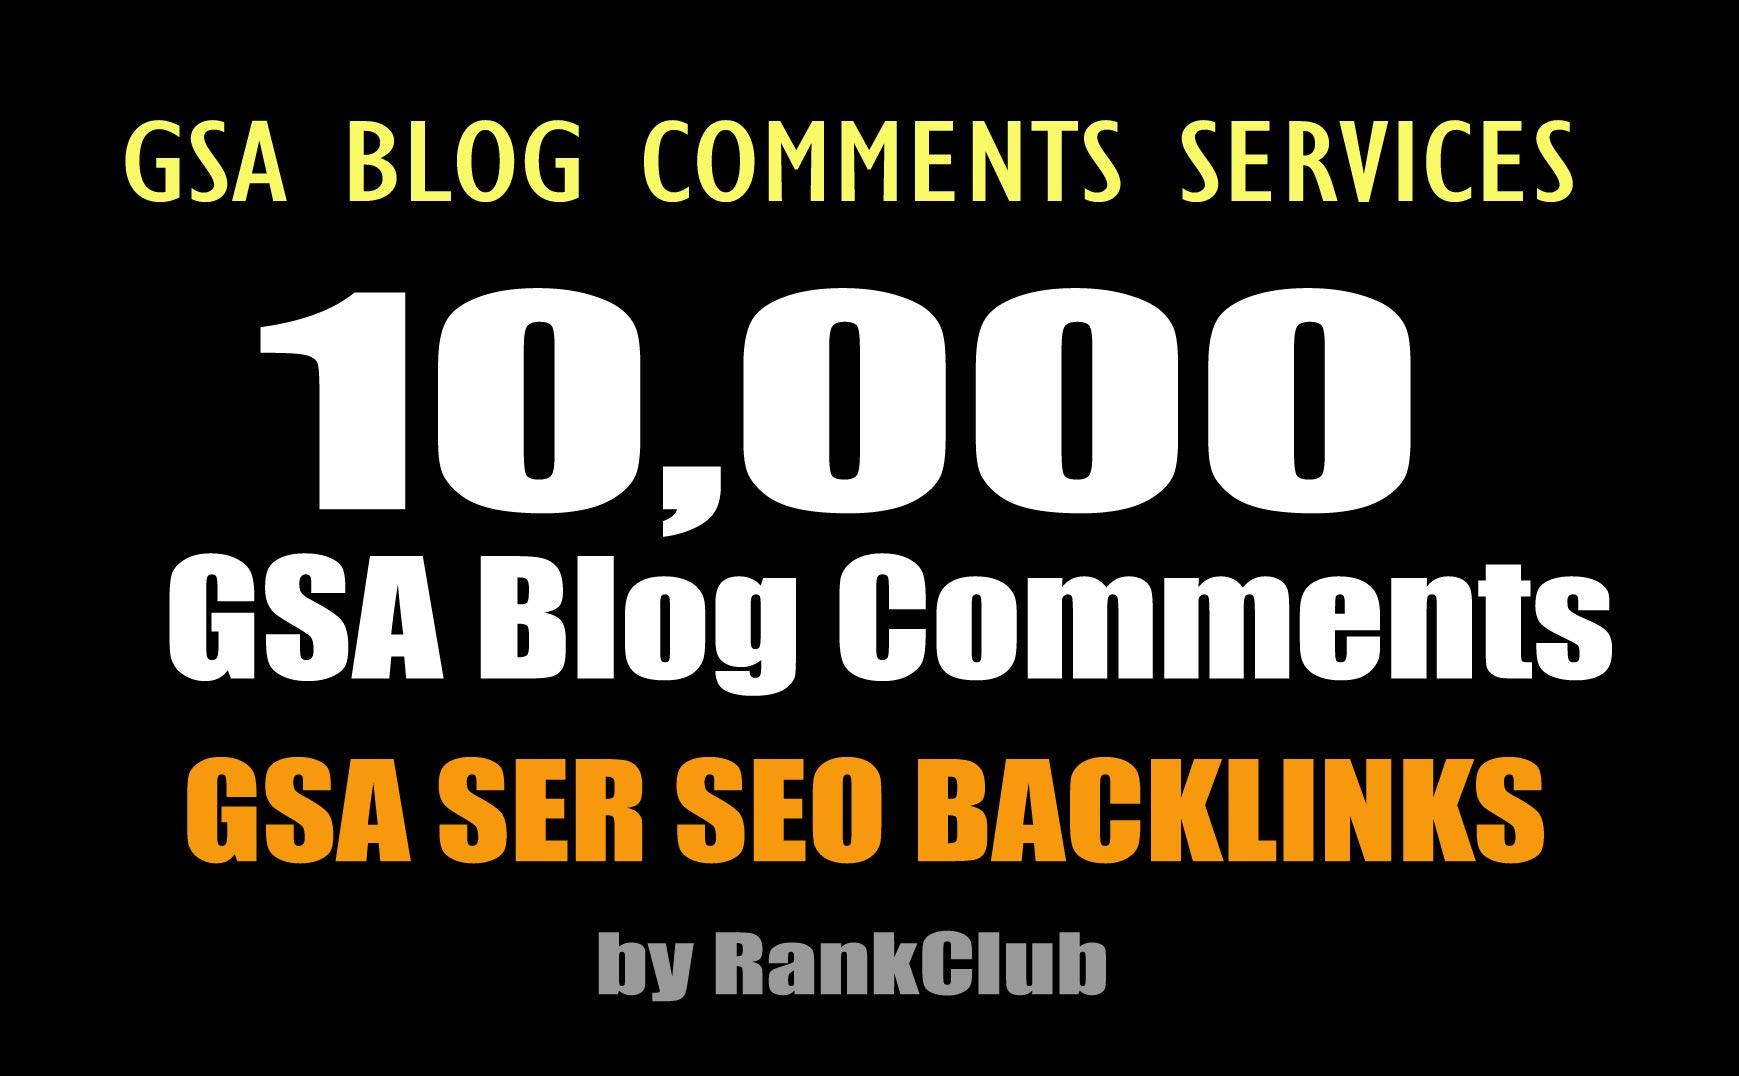 GSA Blast GSA SER To Create 10,000 Blog Comments Backlinks